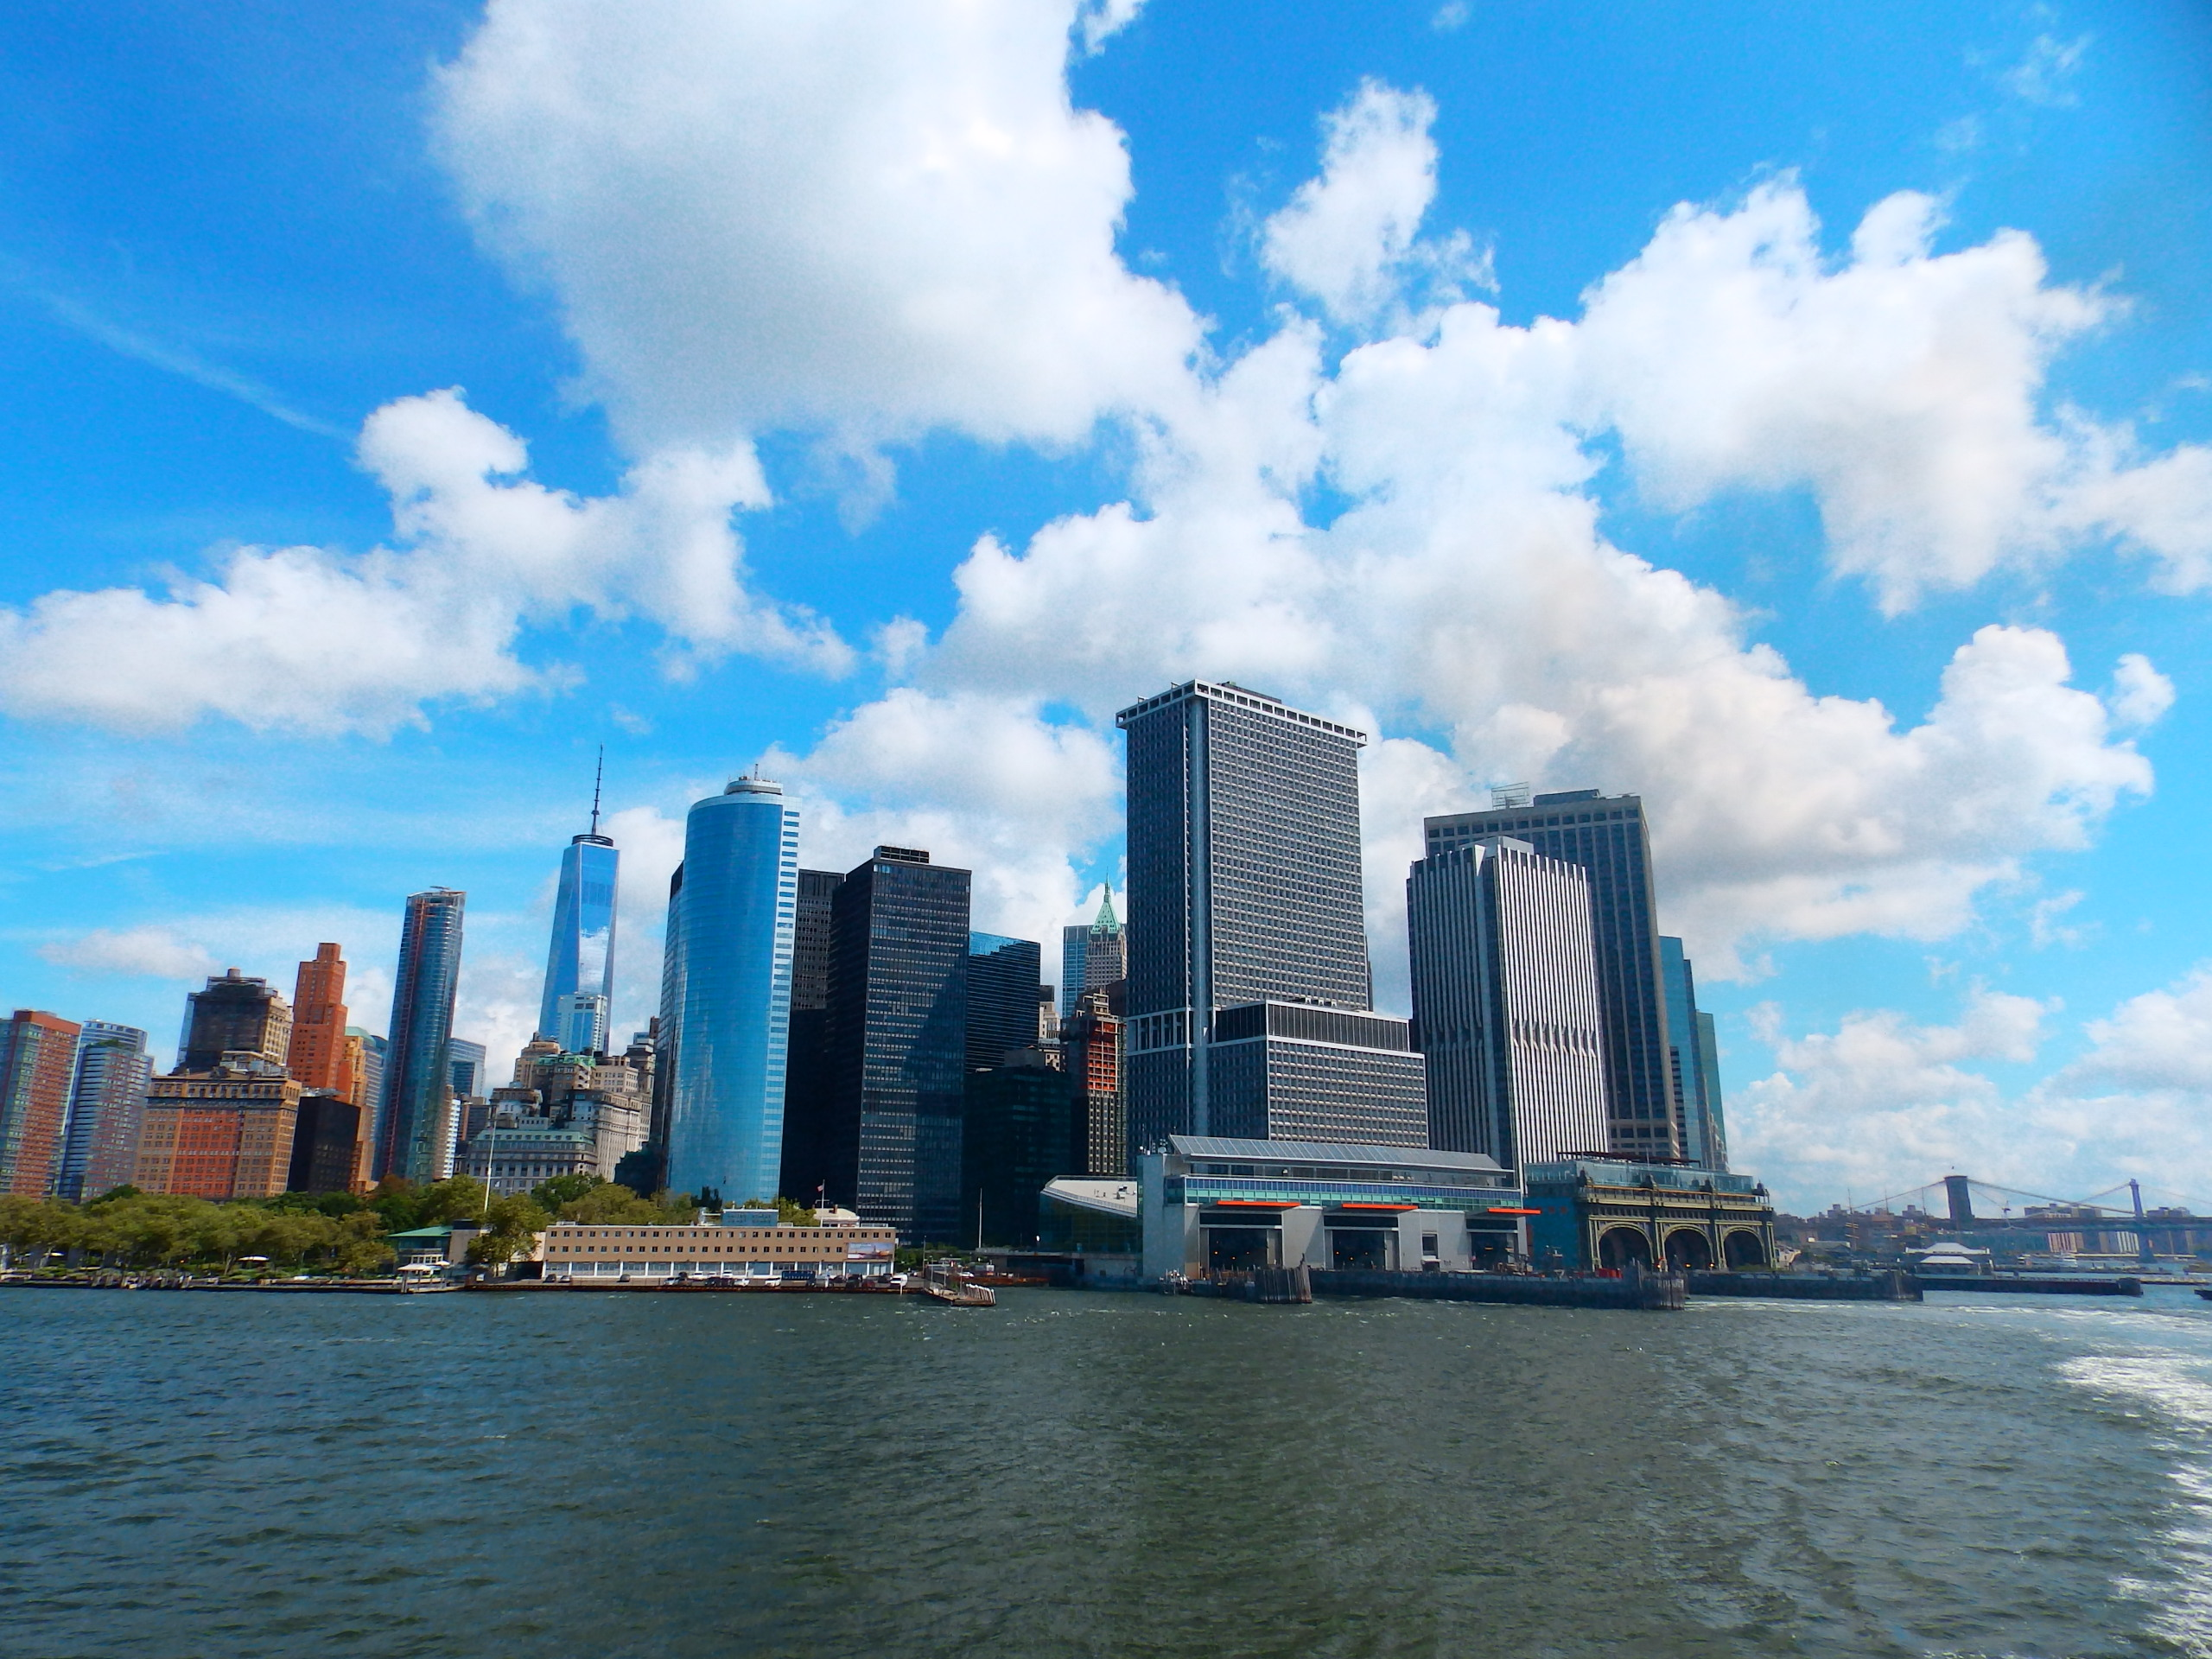 Nueva York ferry